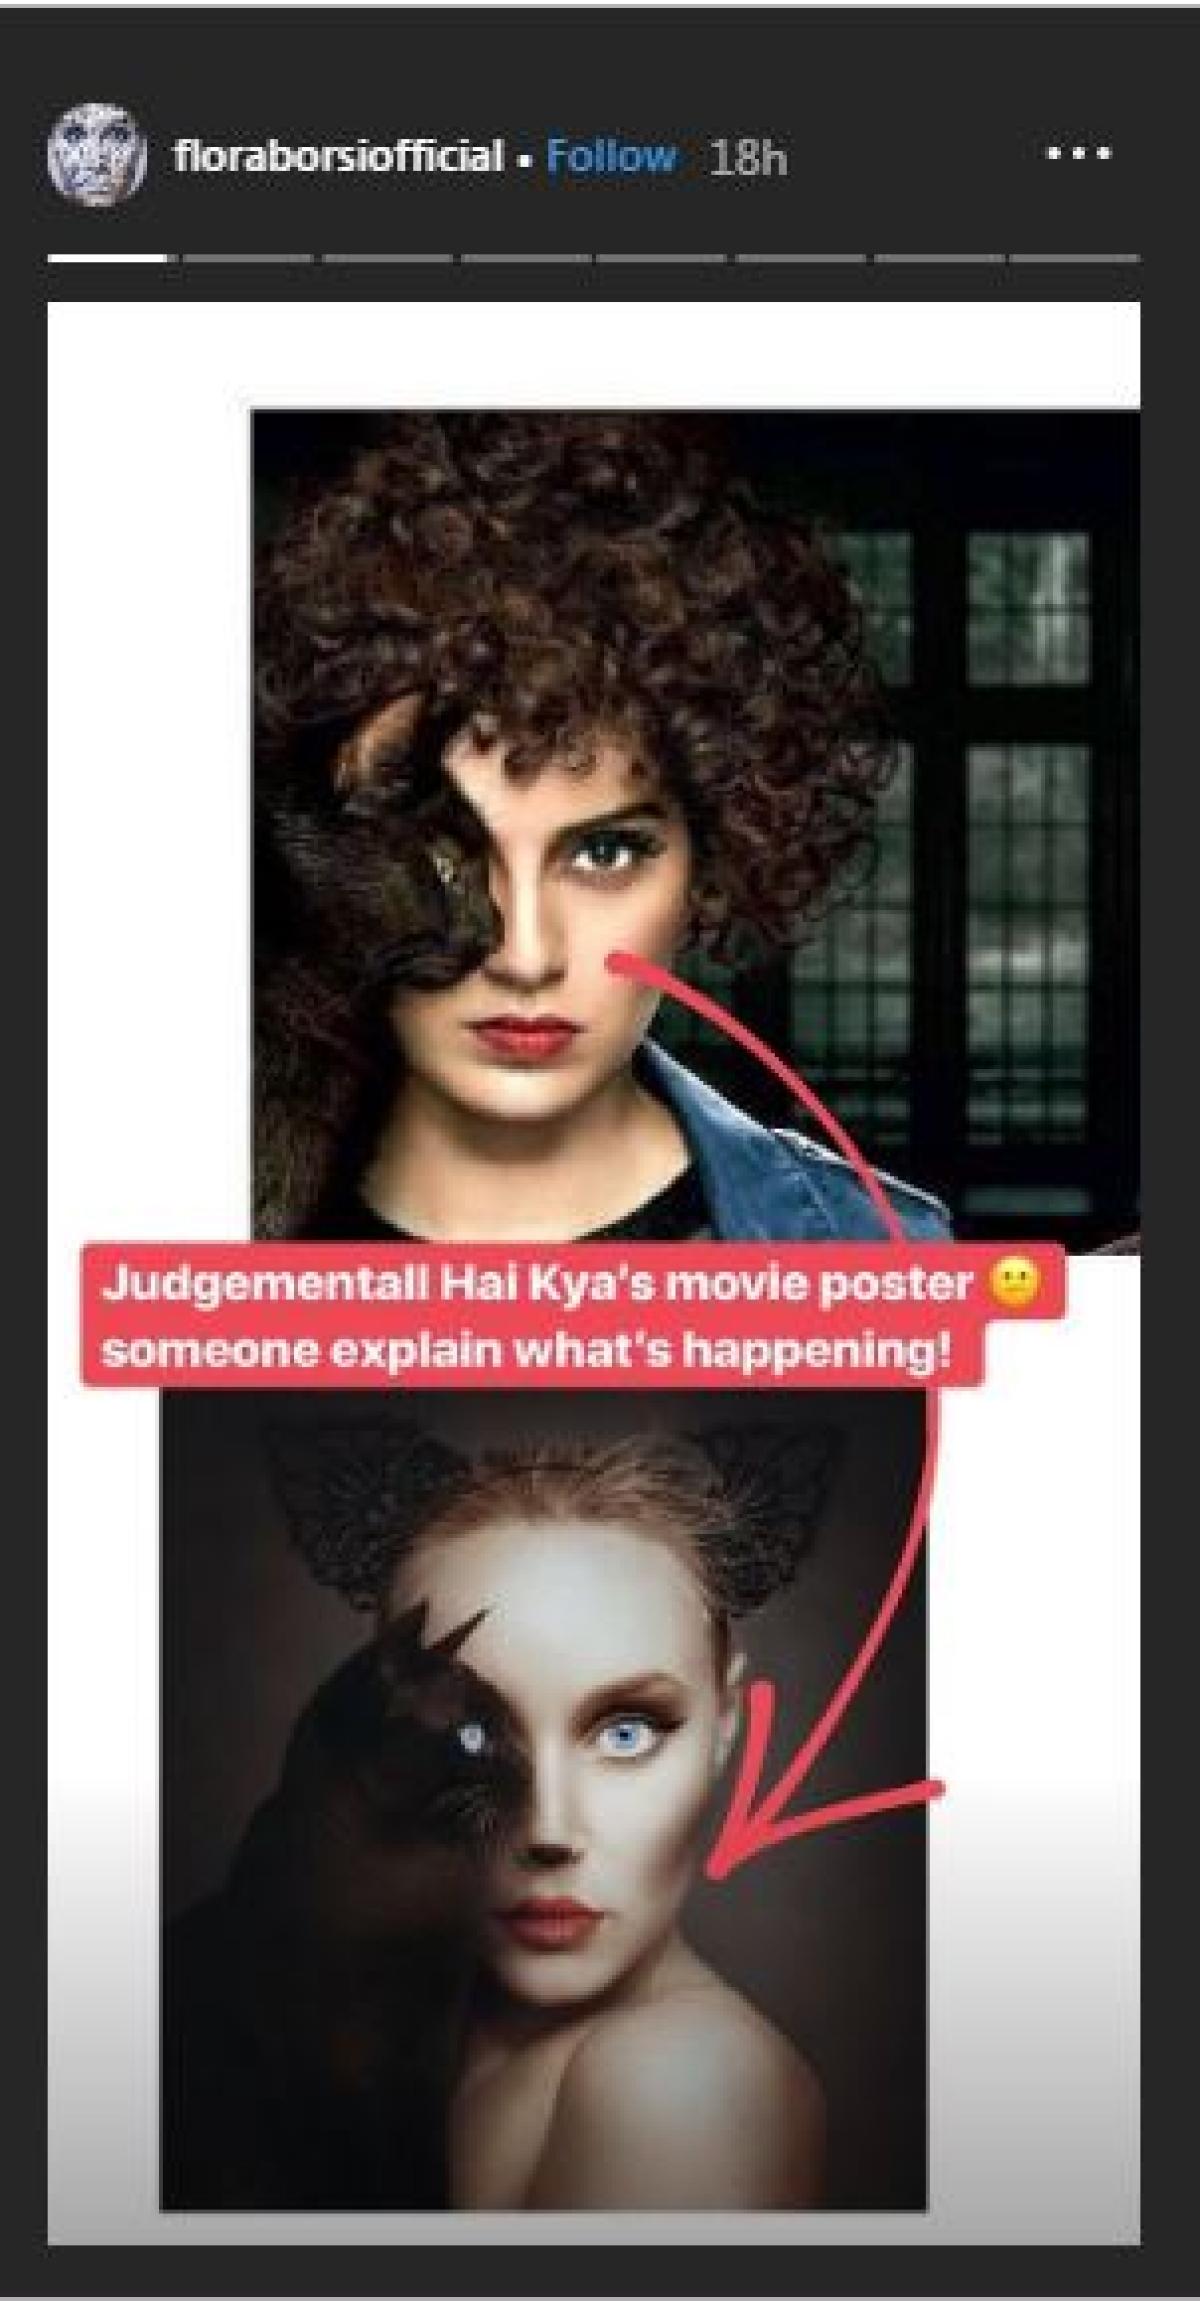 Ekta Kapoor accused of plagiarism by Hungarian artist for 'Judgementall Hai Kya' poster